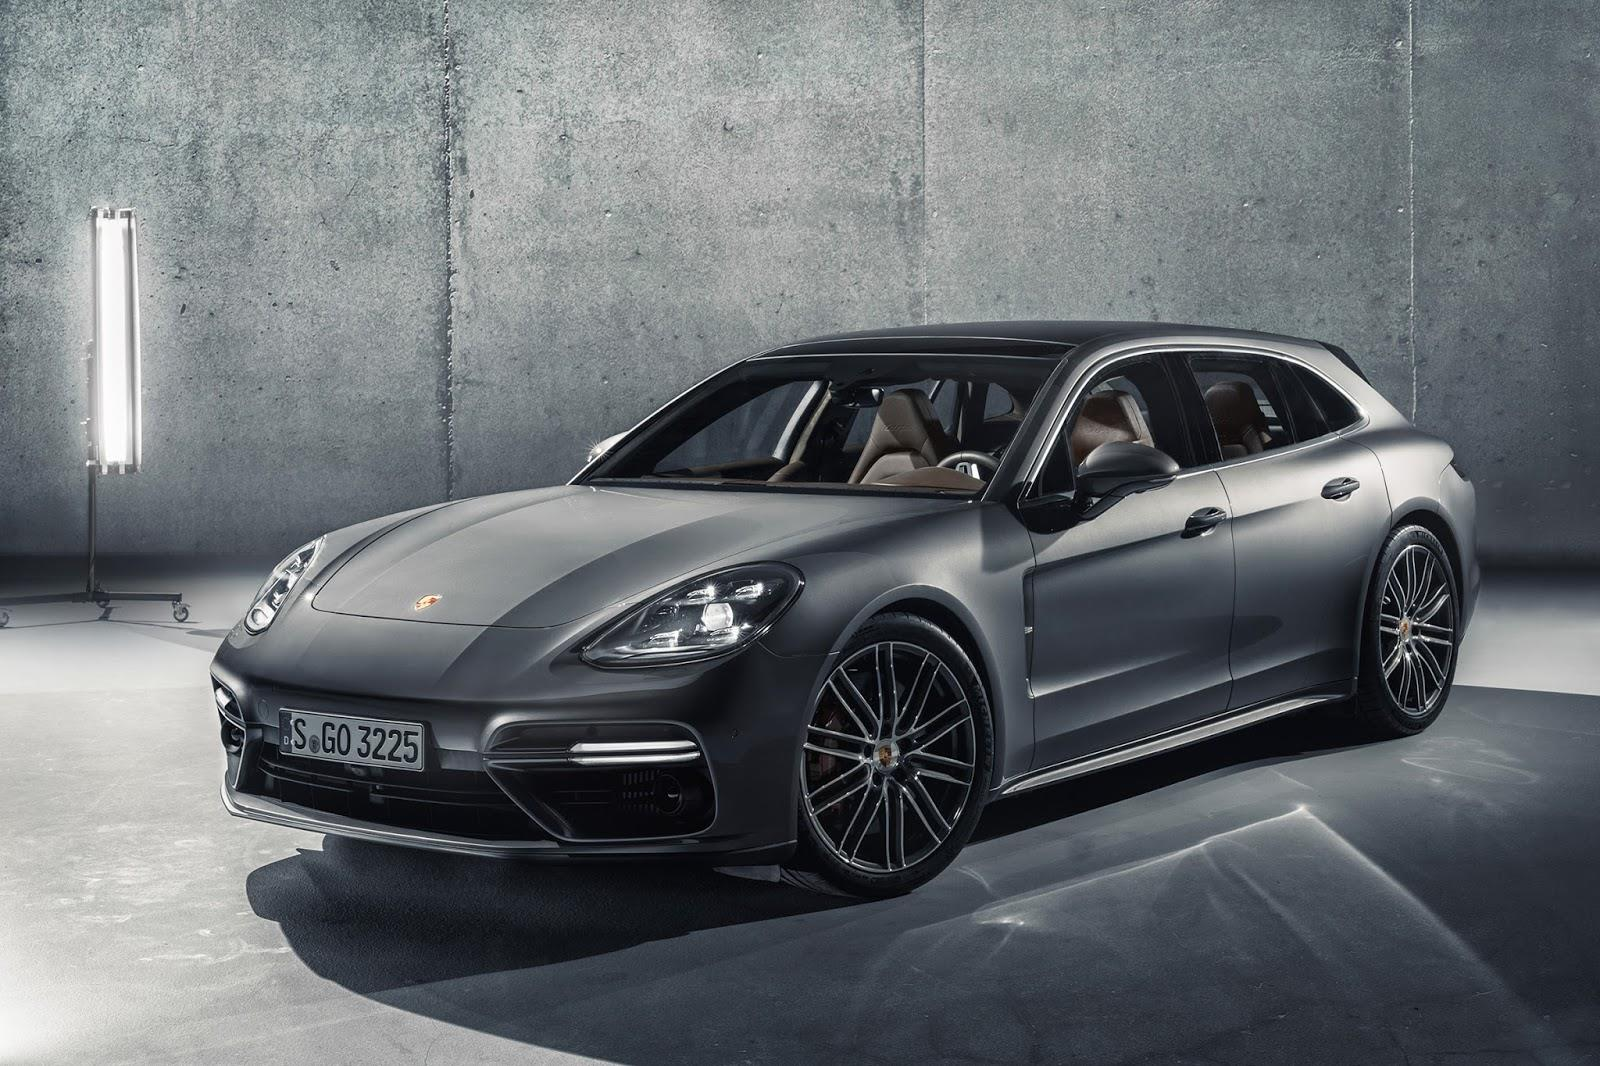 2017 Porsche Panamera Sport Turismo image gallery